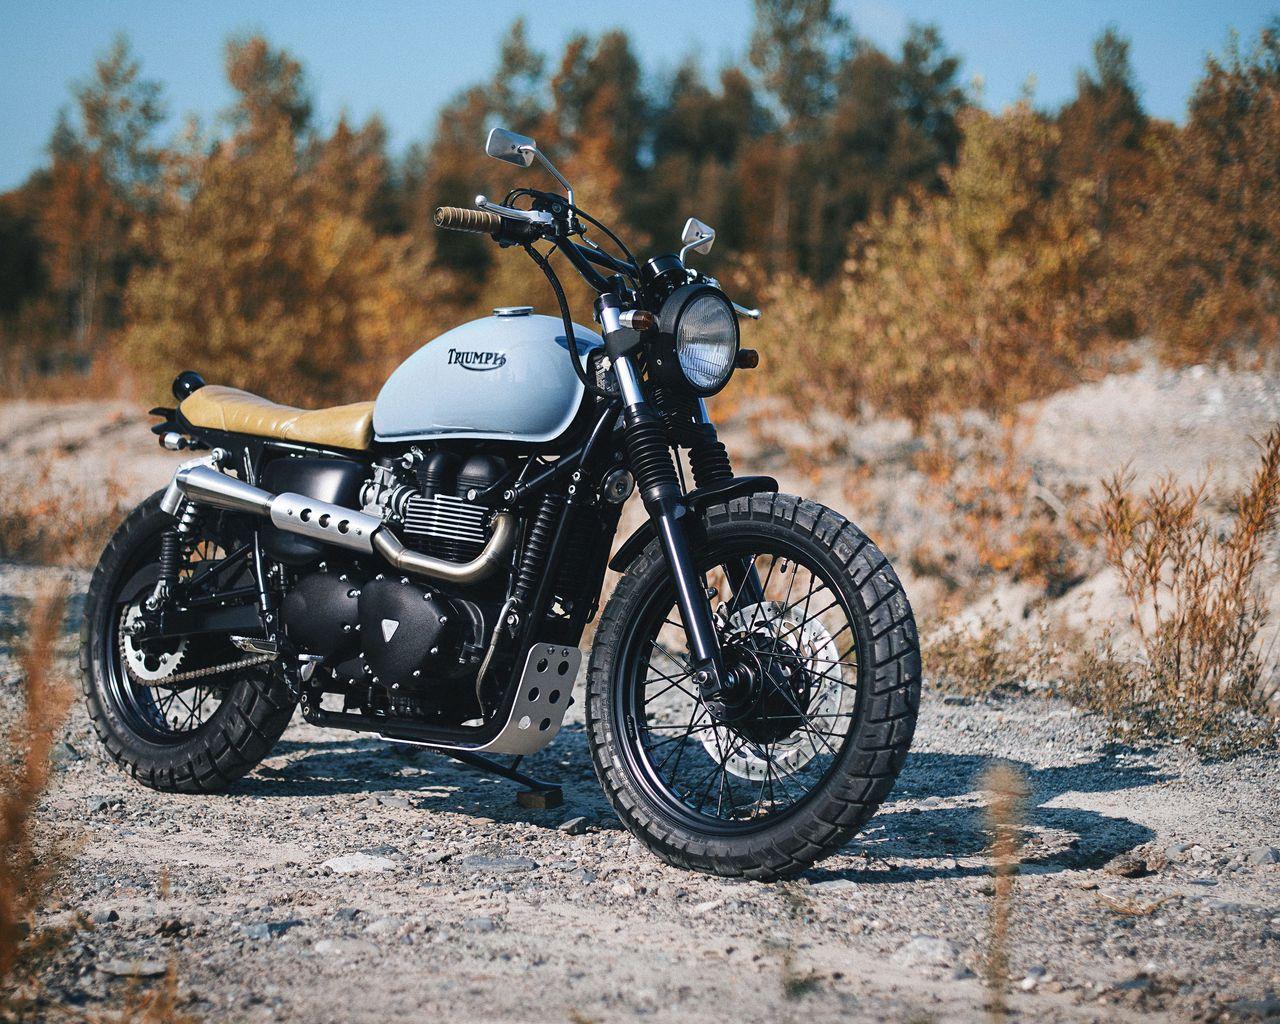 1280x1024 Обои triumph, bonneville, мотоцикл, вид сбоку